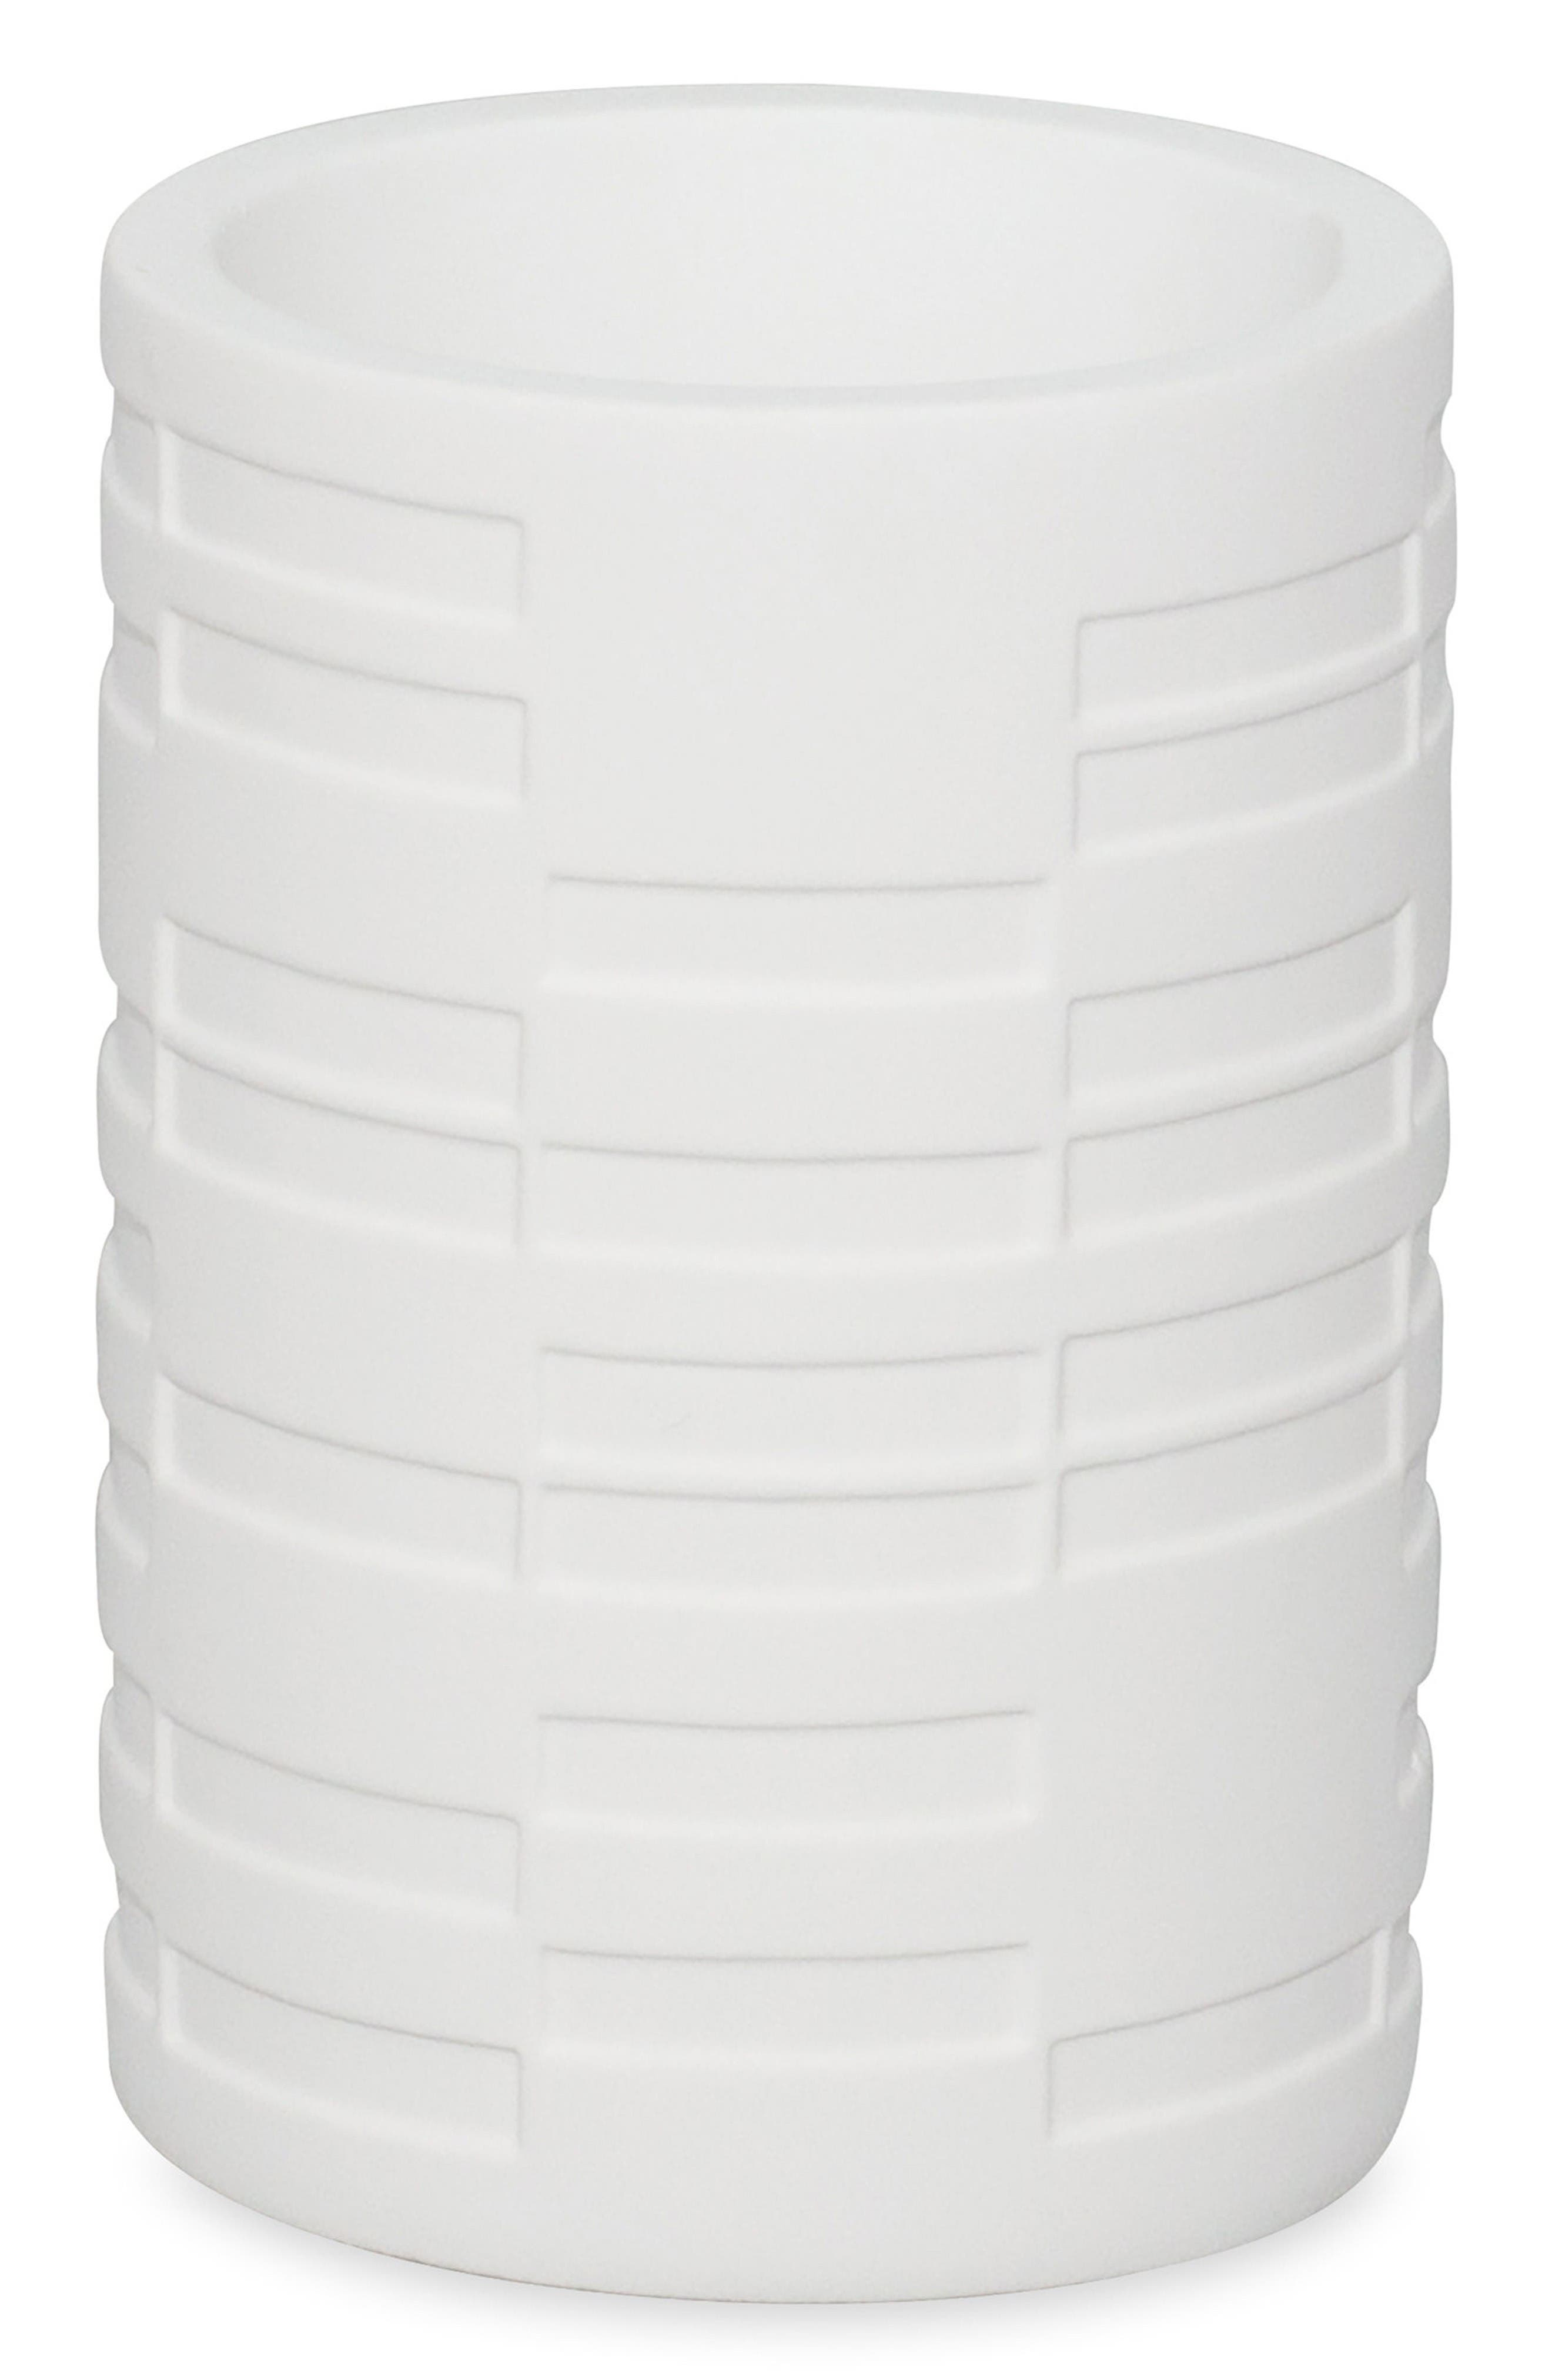 High Rise Tumbler,                         Main,                         color, White